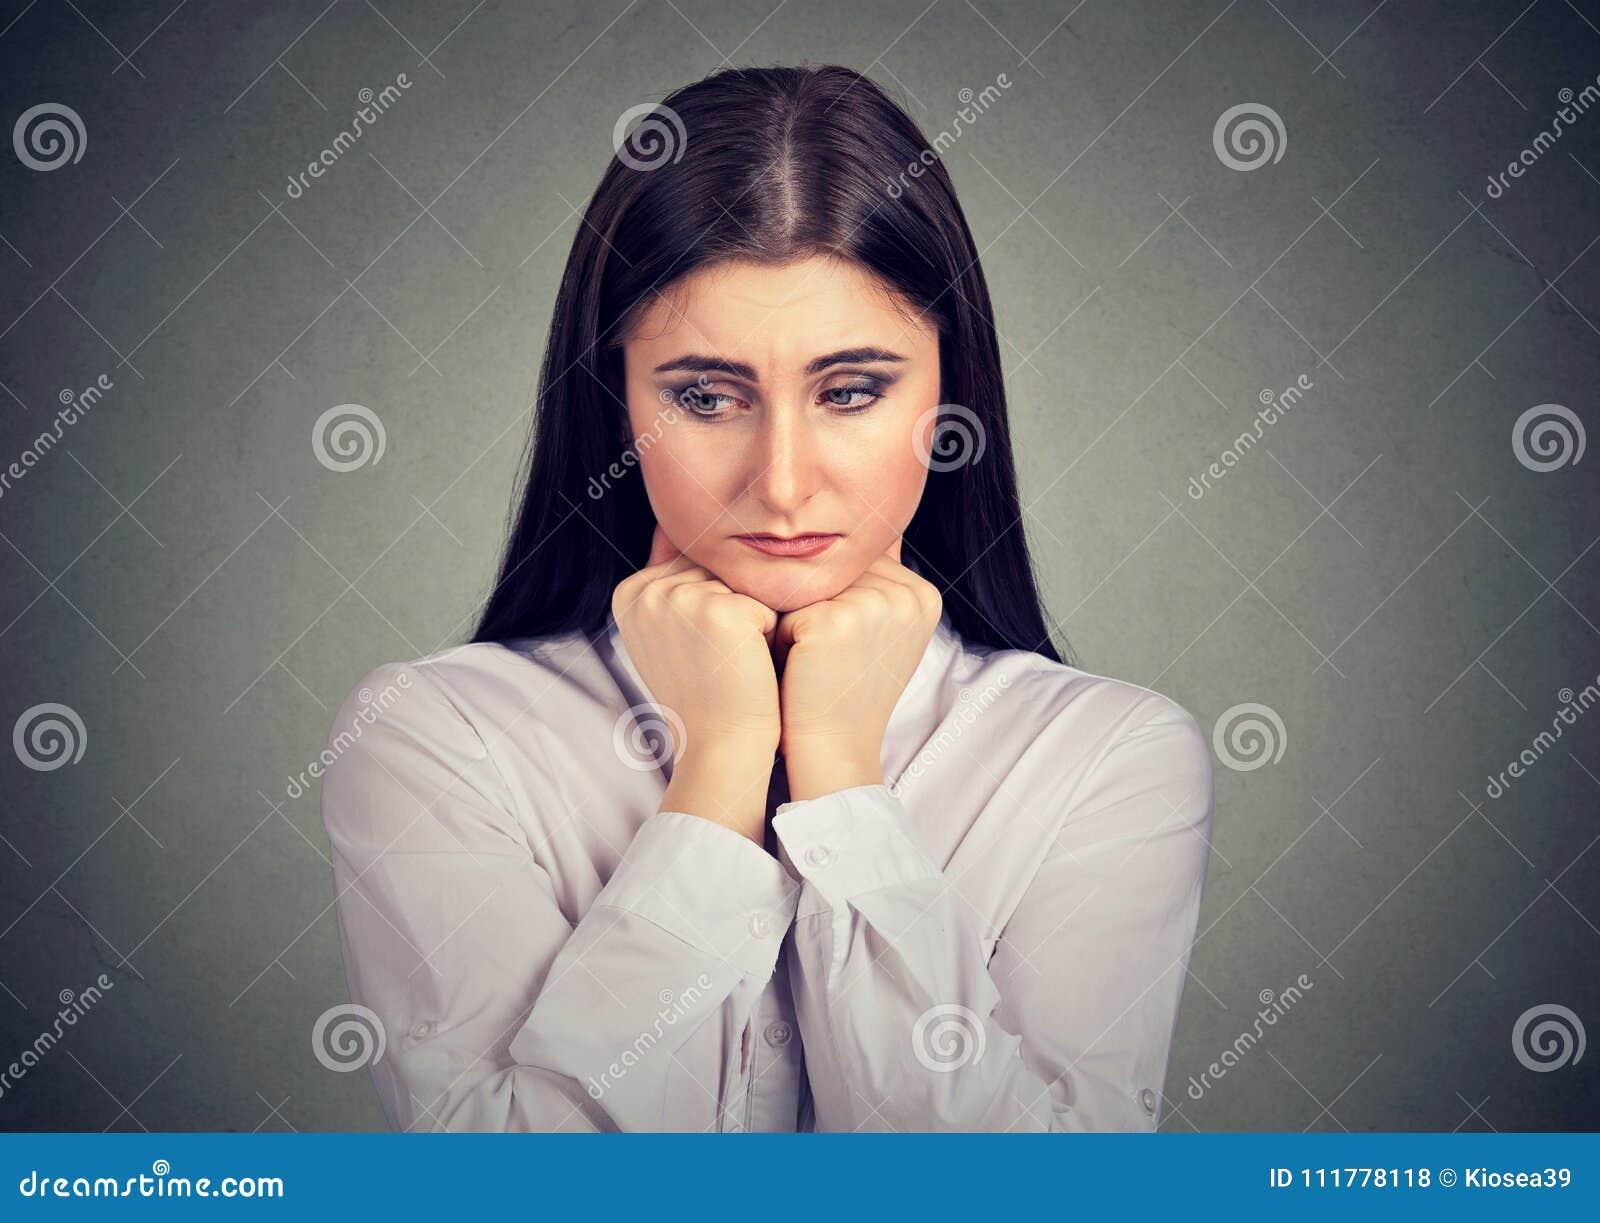 Sad youn girl looking melancholic